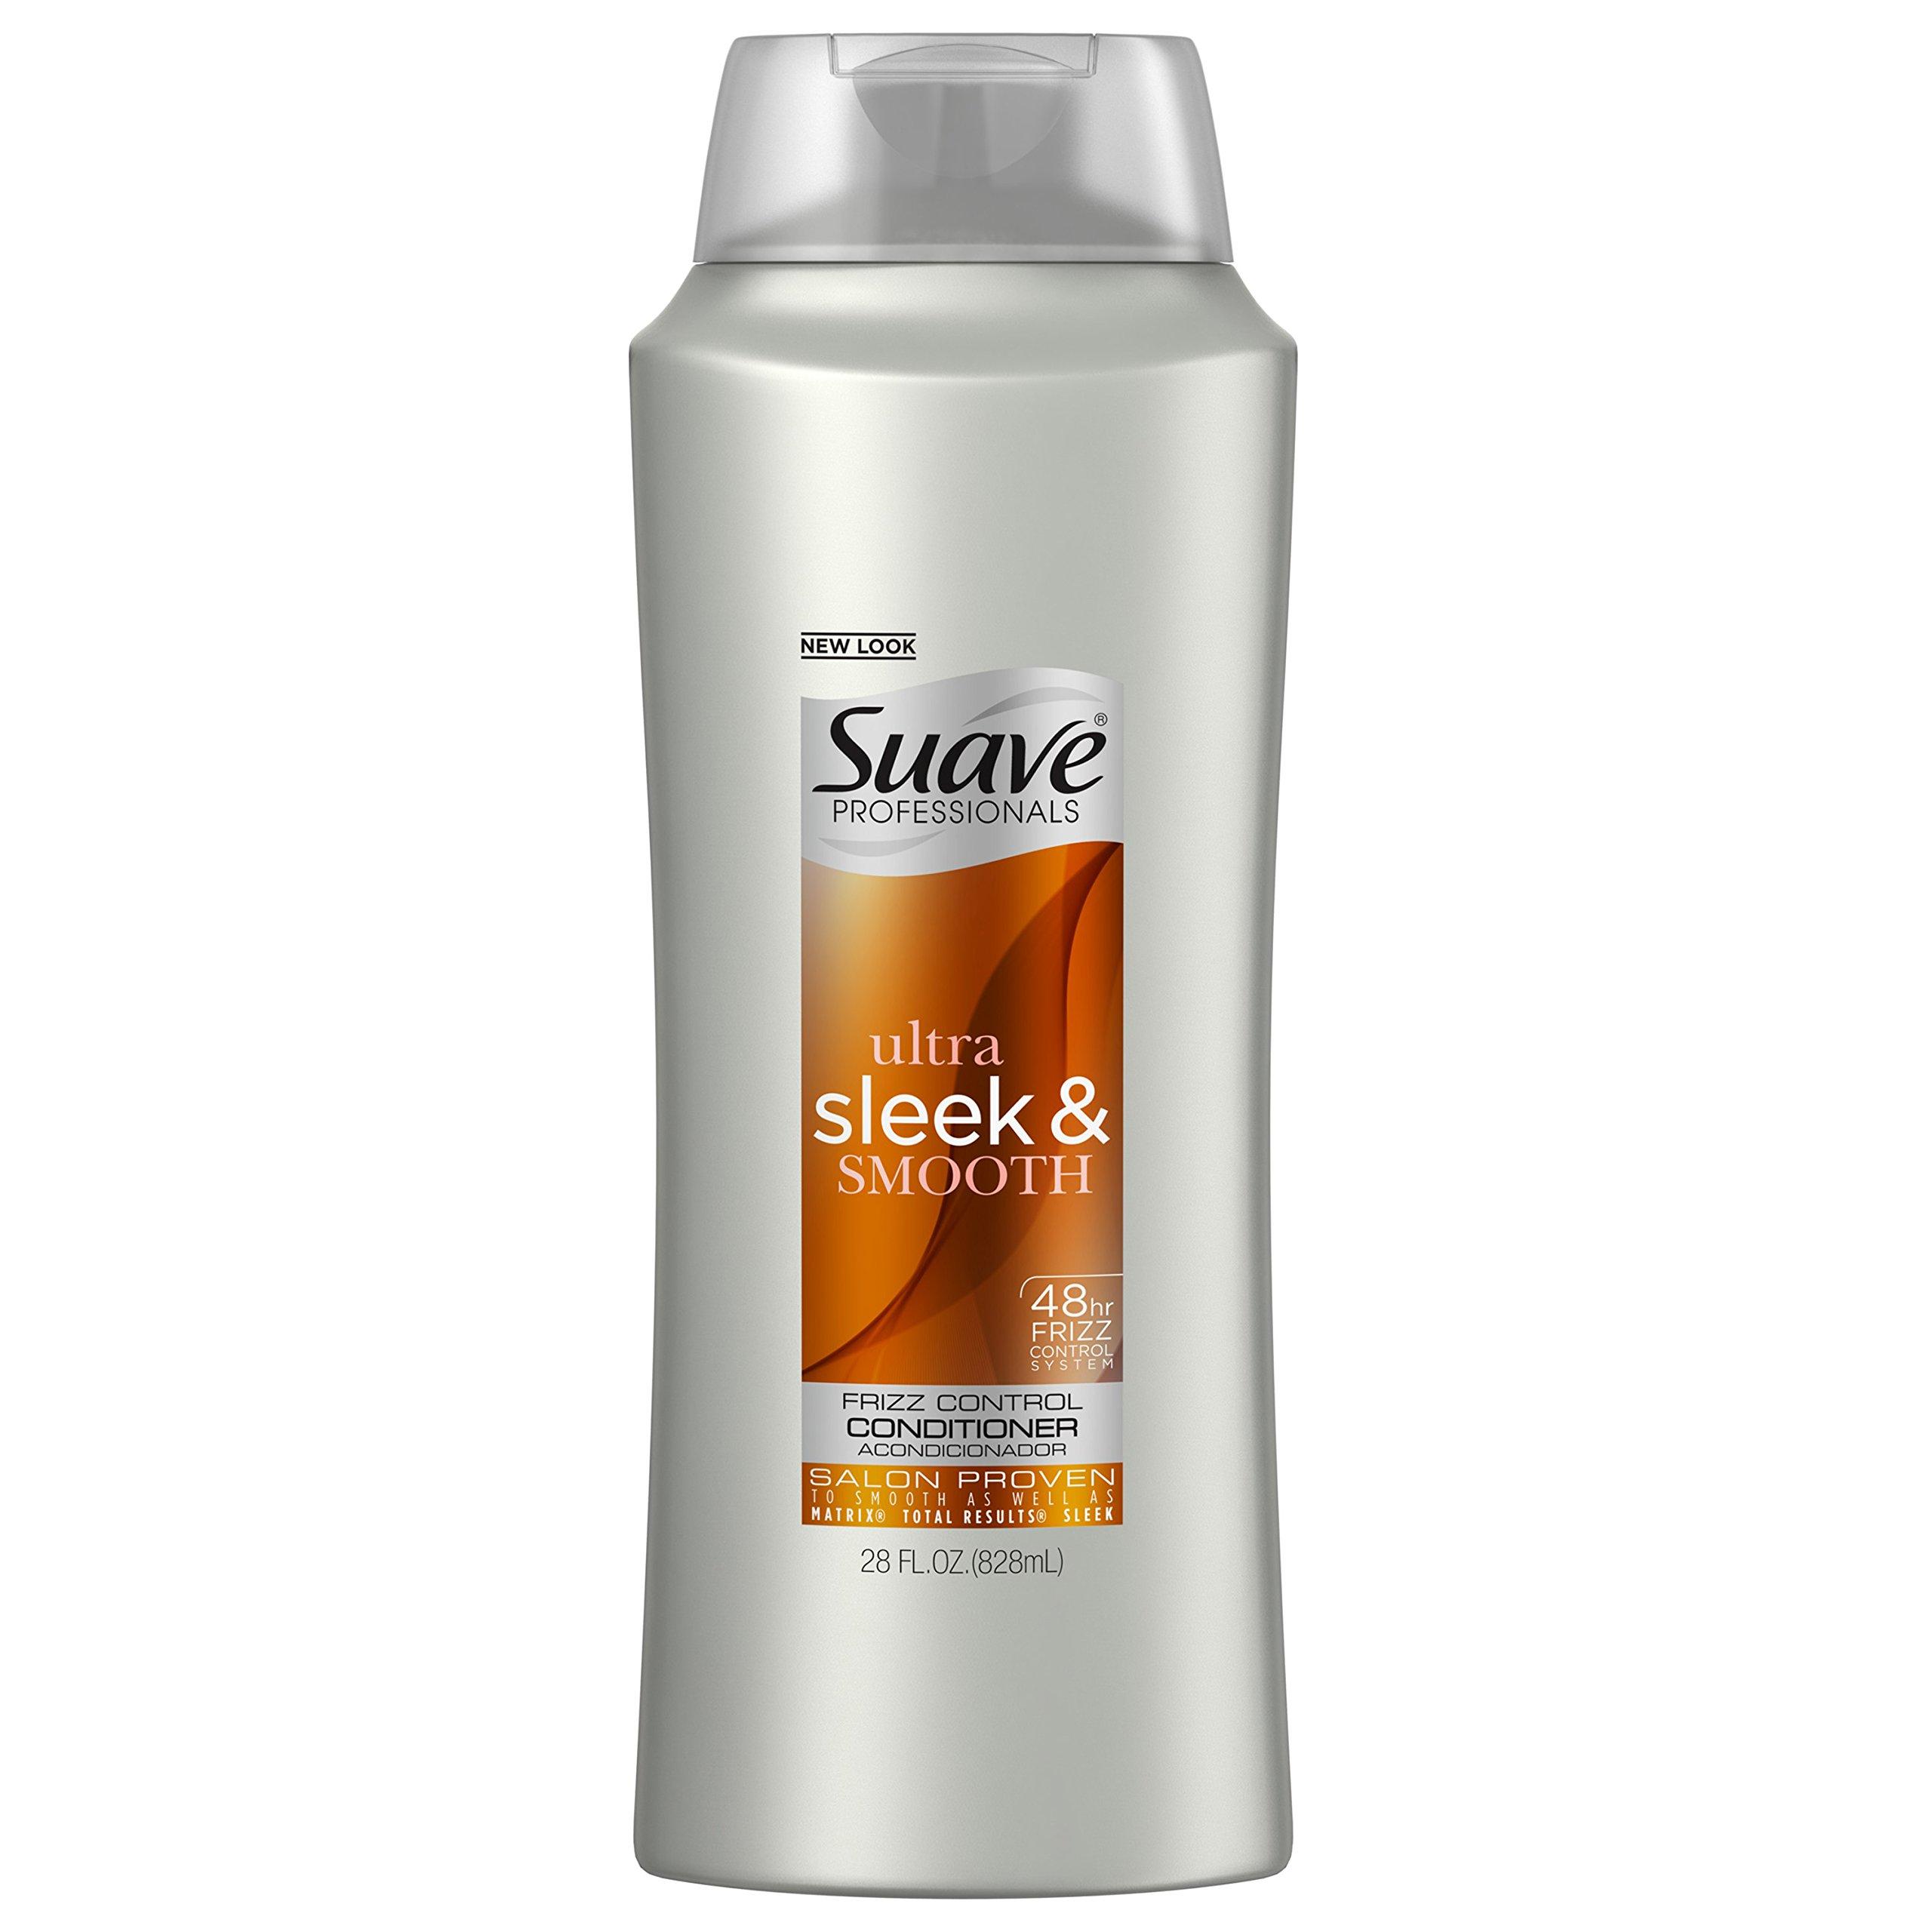 Suave Professionals Conditioner, Sleek, 28 oz